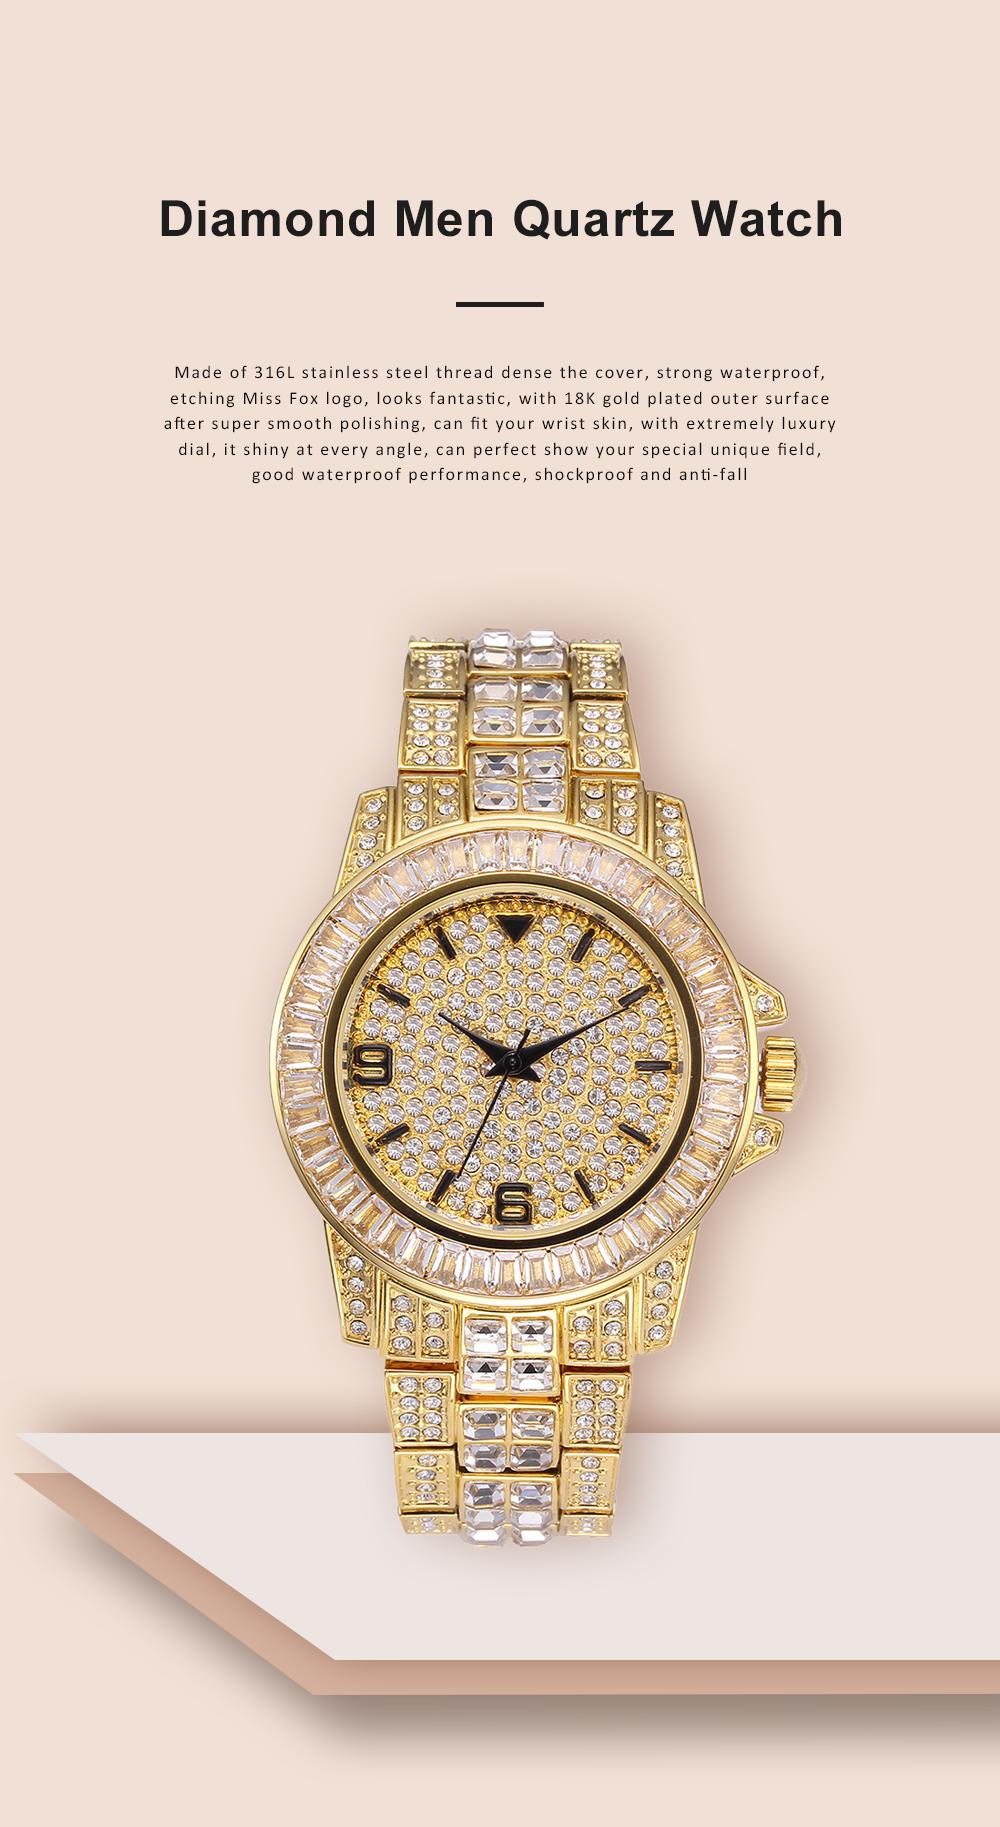 New Men Fashion Exquisite Waterproof Diamond Date Quartz Watch Gold Stainless Steel Business Luxury Mens Watches 0